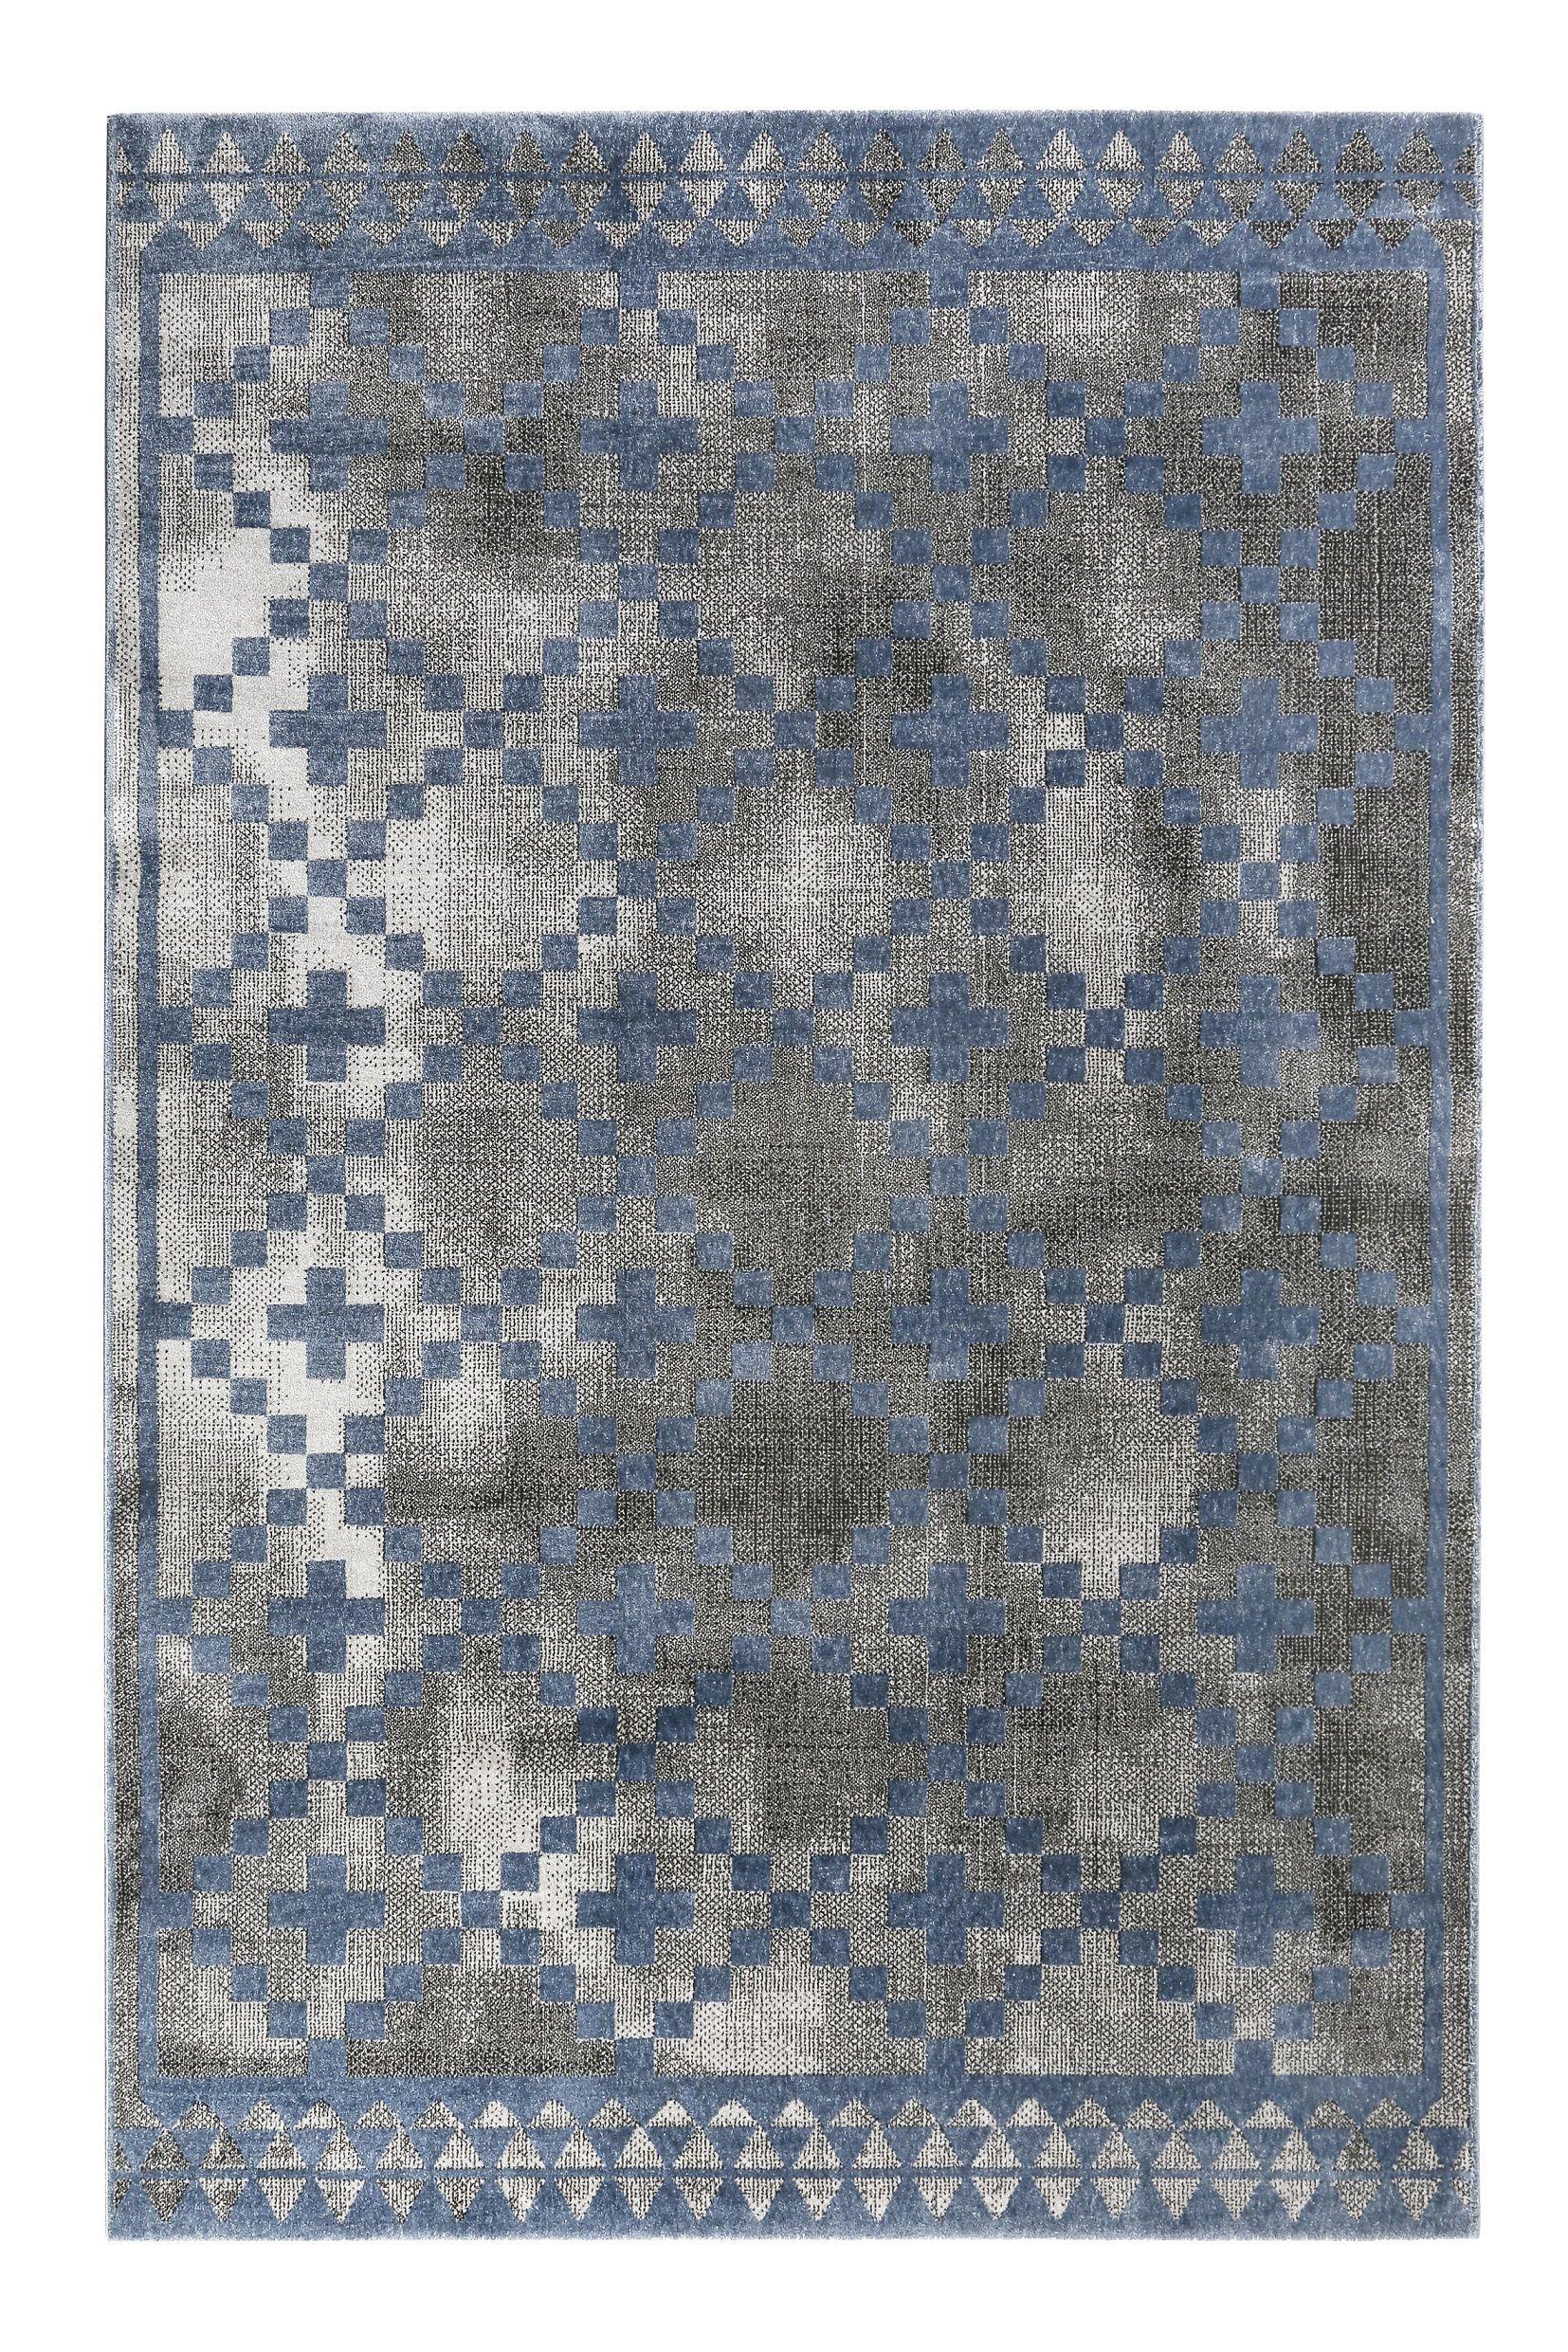 Wecon Home Kurzflor Teppich Pleasure 2 Grau Blau Kurzflor Teppiche Teppich Geometrisches Muster